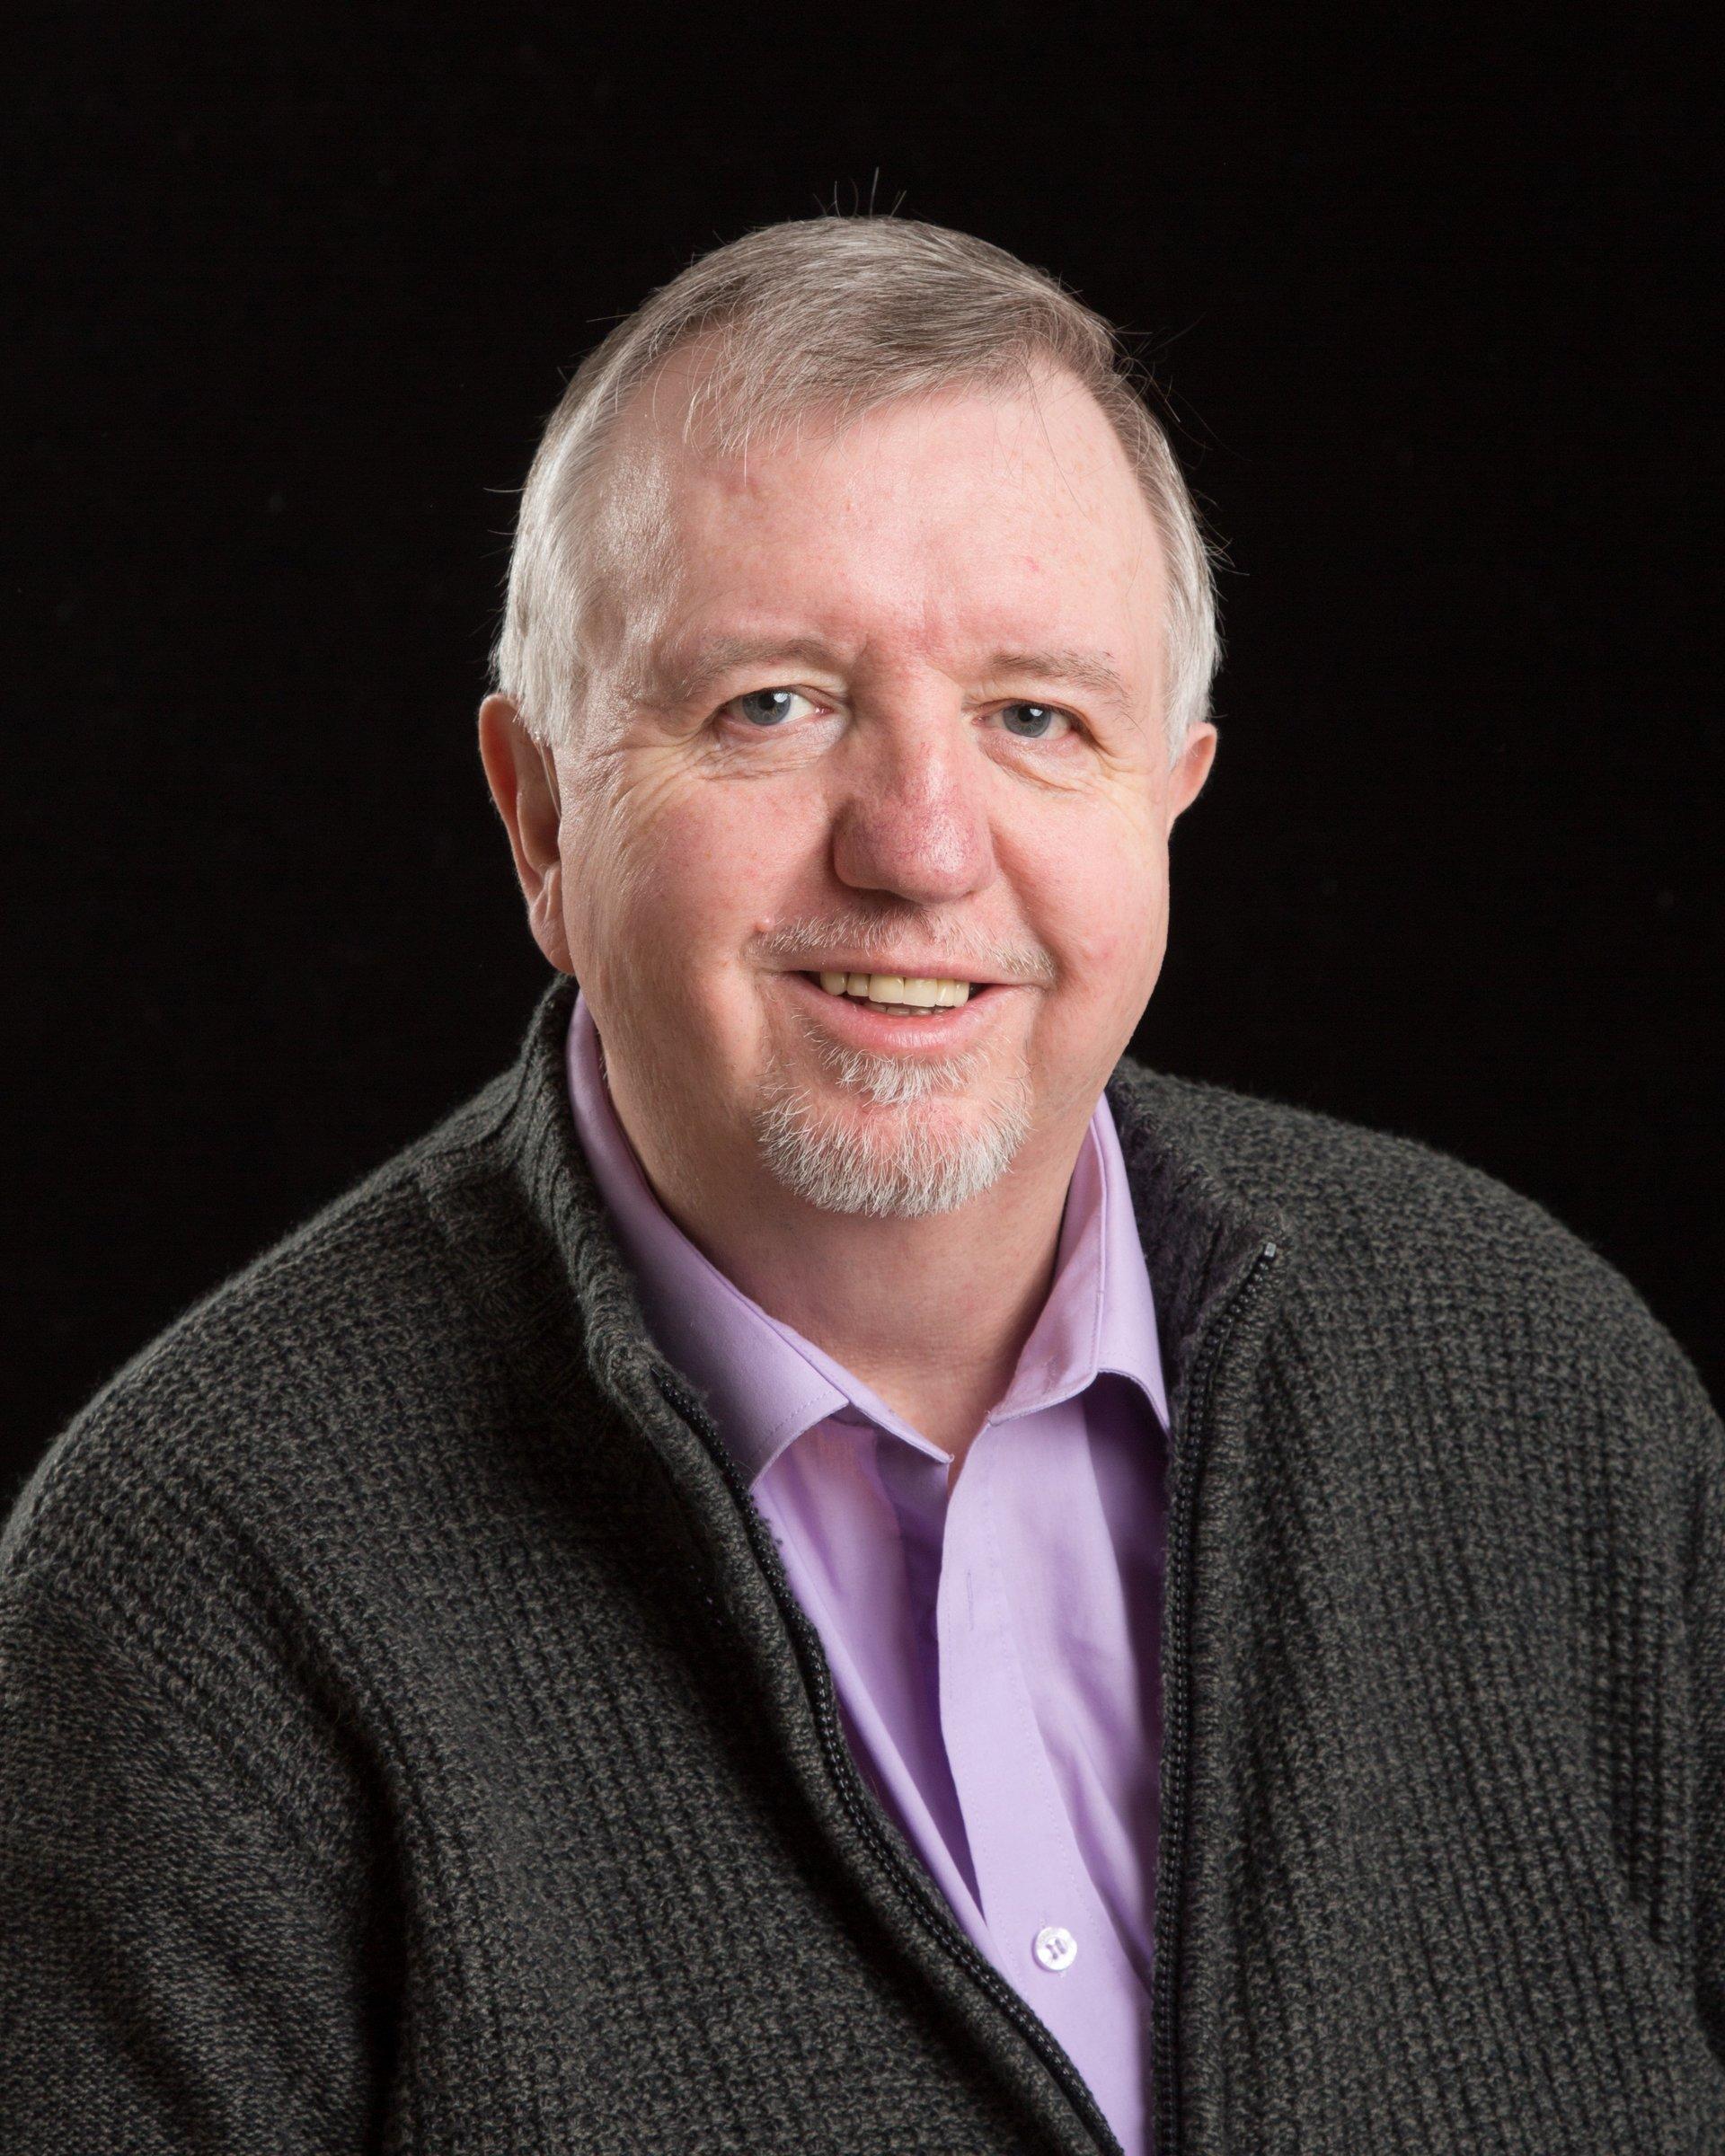 Ian Hextall @uk genealogy com